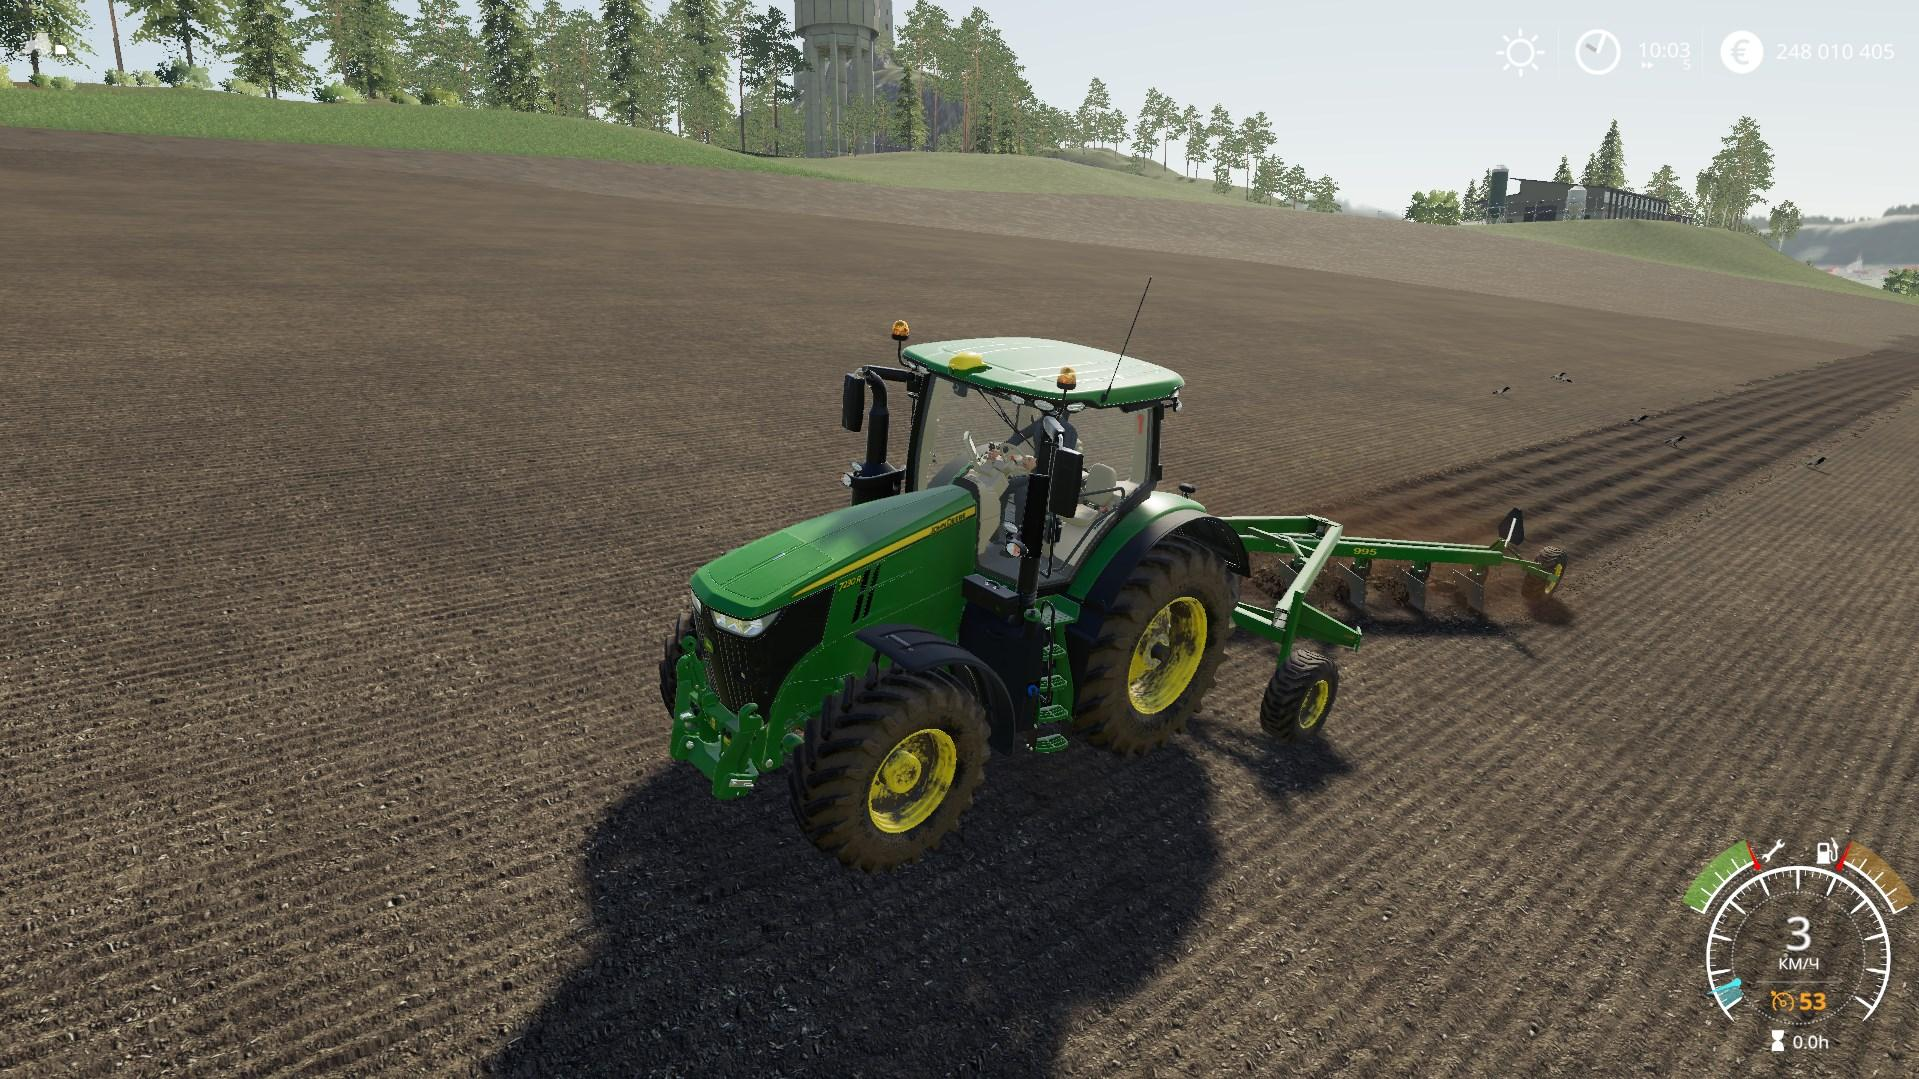 John Deere 995 v1 0 0 0 FS 19 - Farming simulator 17 / 2017 mod